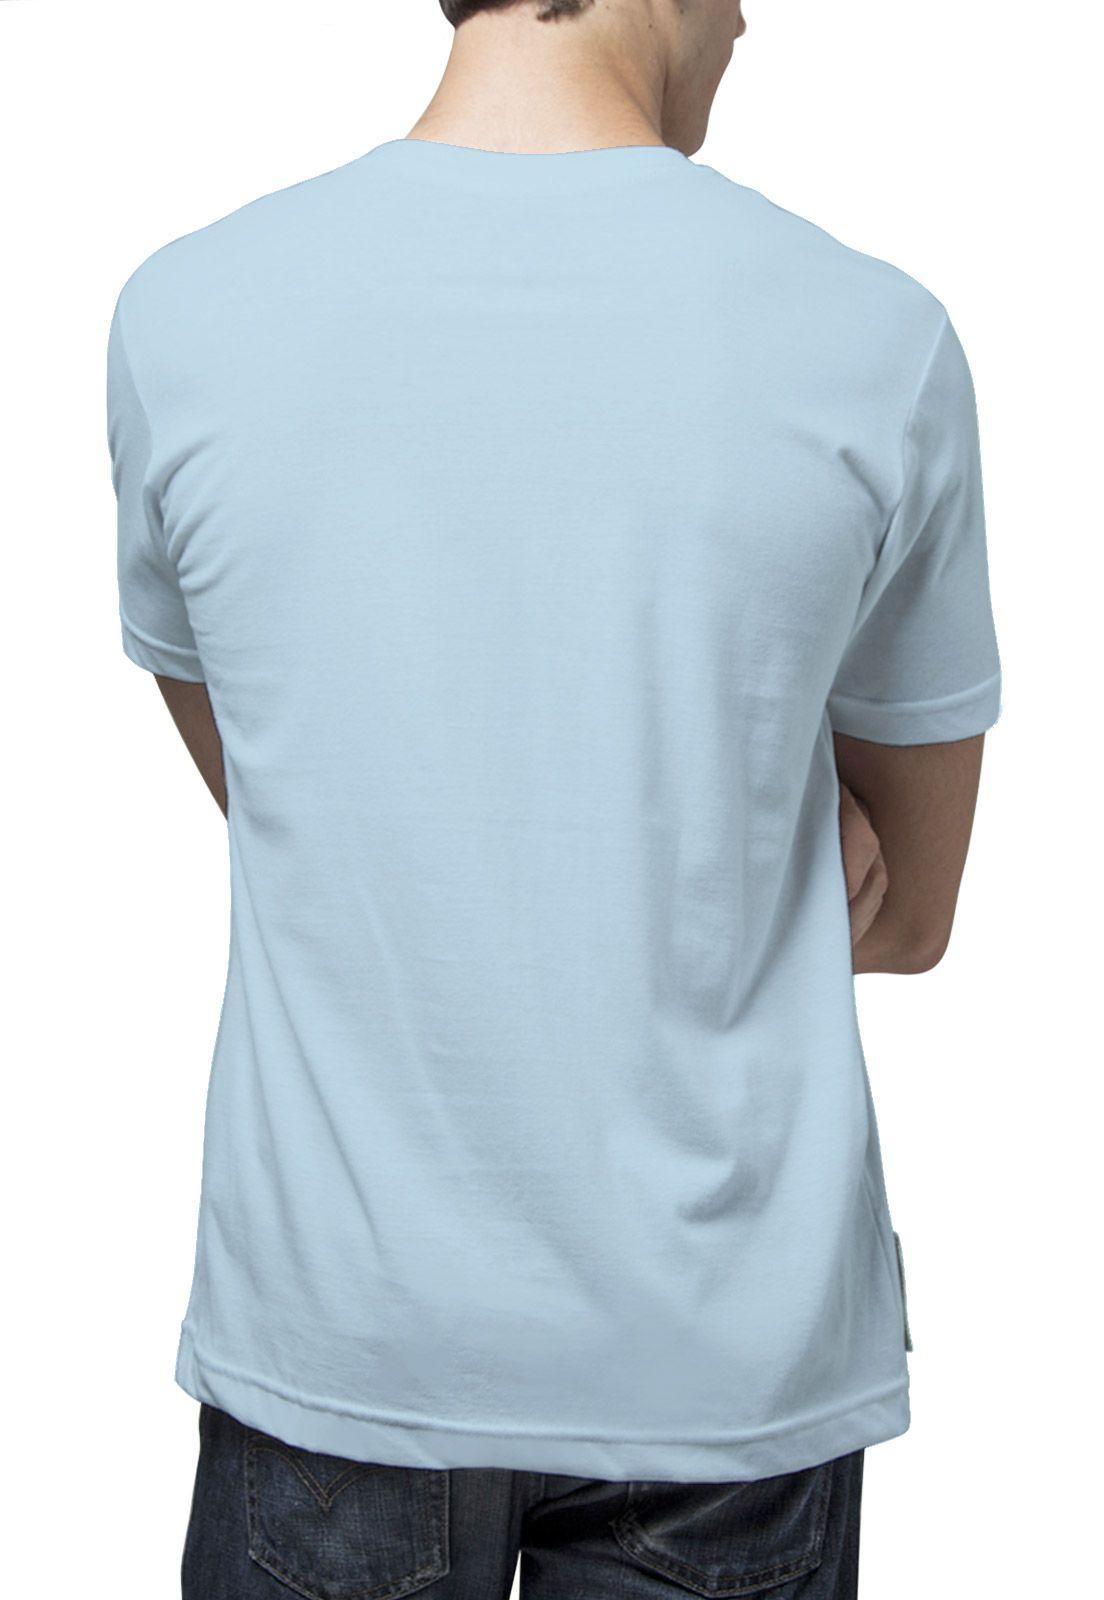 Camiseta Amazônia Jubarte - Azul Claro